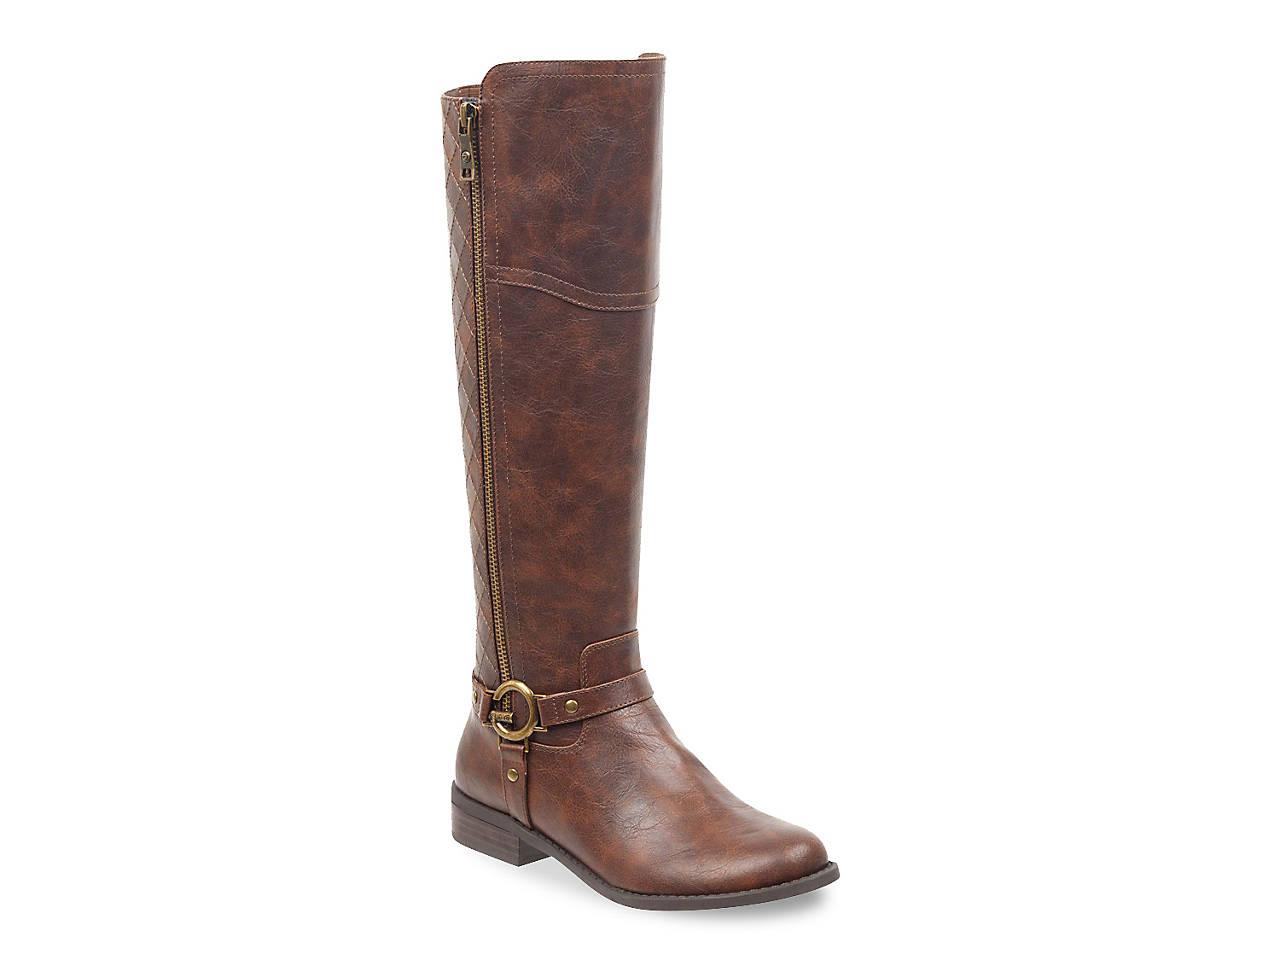 55e904e59 G by GUESS Horton Riding Boot Women's Shoes | DSW